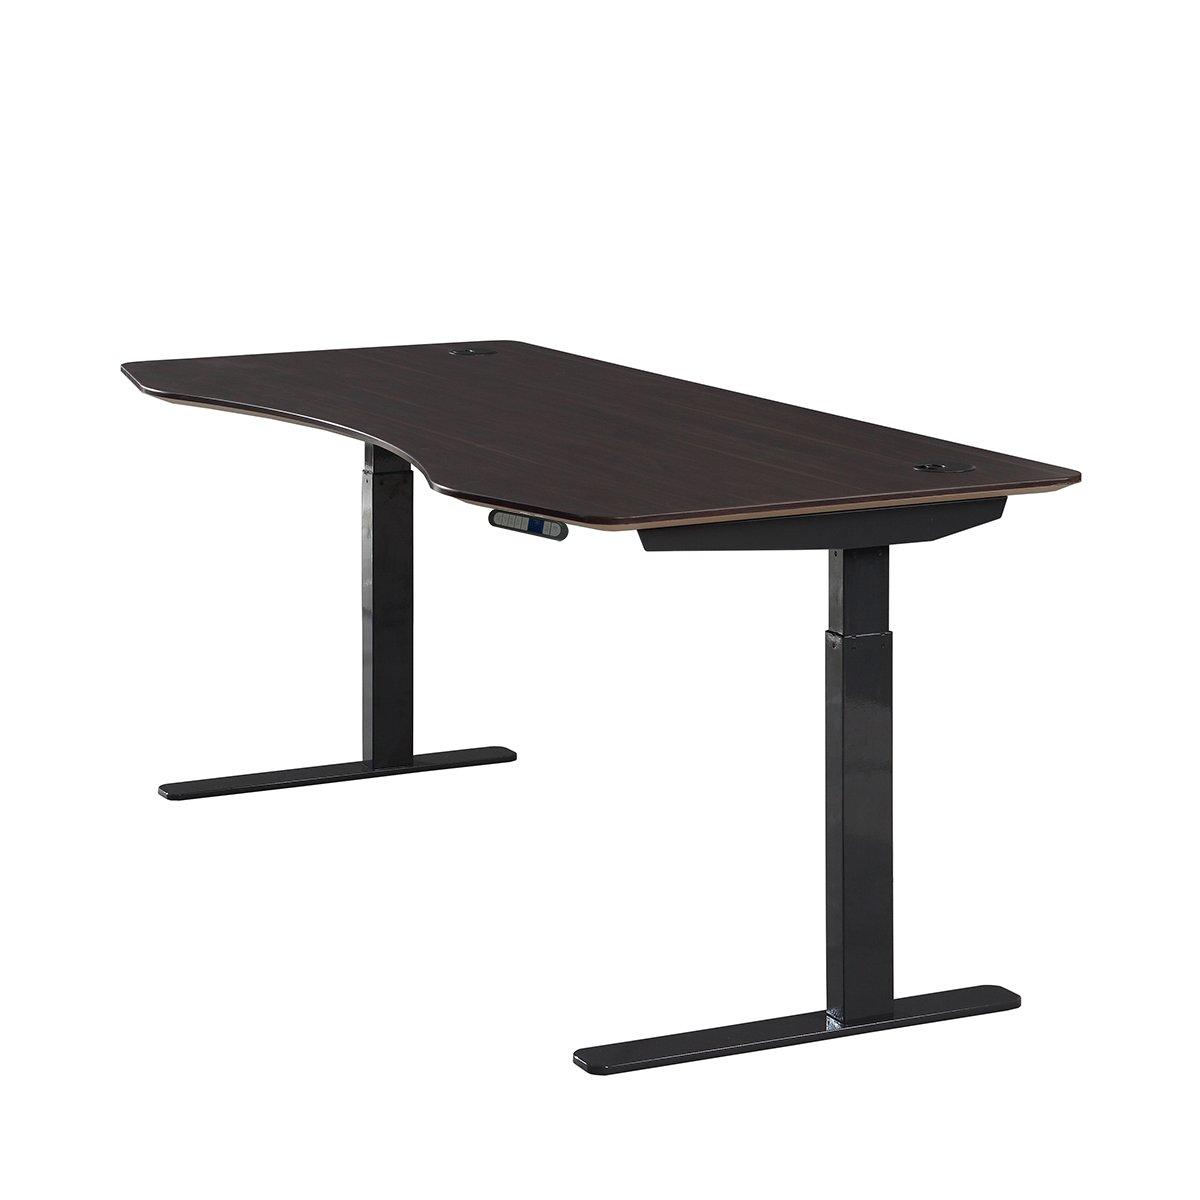 ApexDesk Elite Series 71'' W Electric Height Adjustable Standing Desk (Memory Controller, 71'' Walnut Top, Black Frame) by ApexDesk